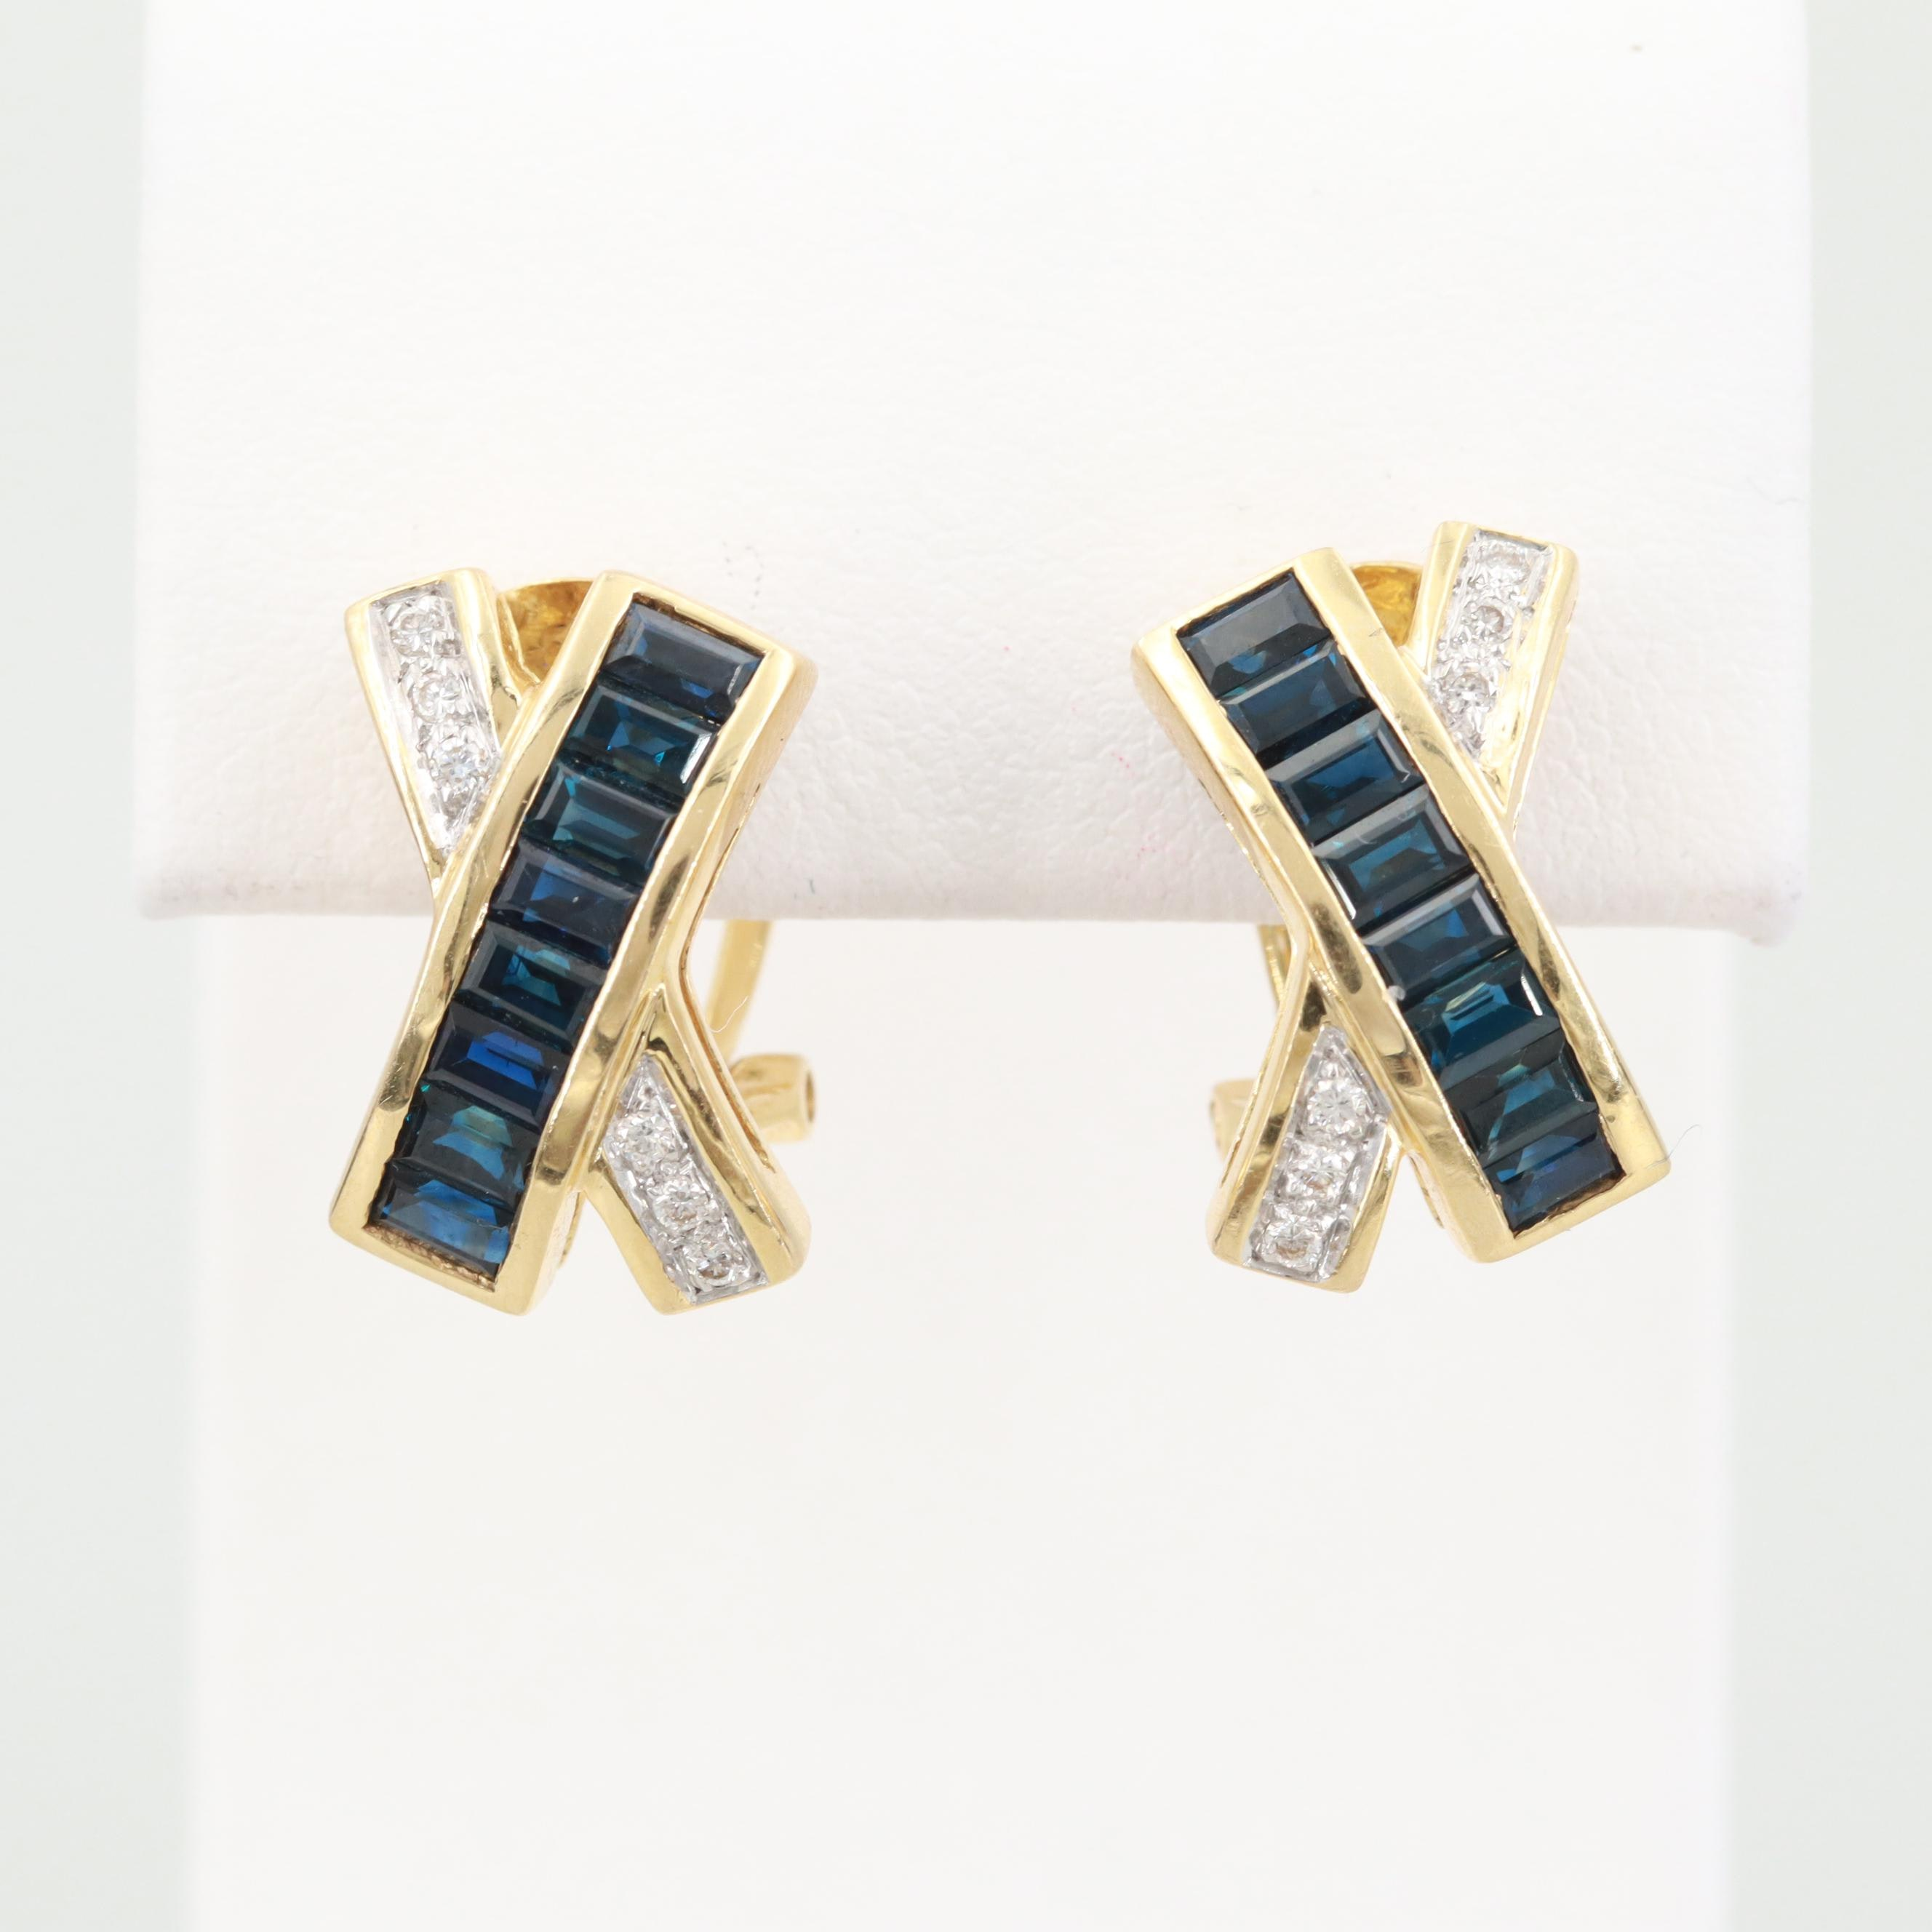 Le Vian 18K Yellow Gold Sapphire and Diamond Earrings